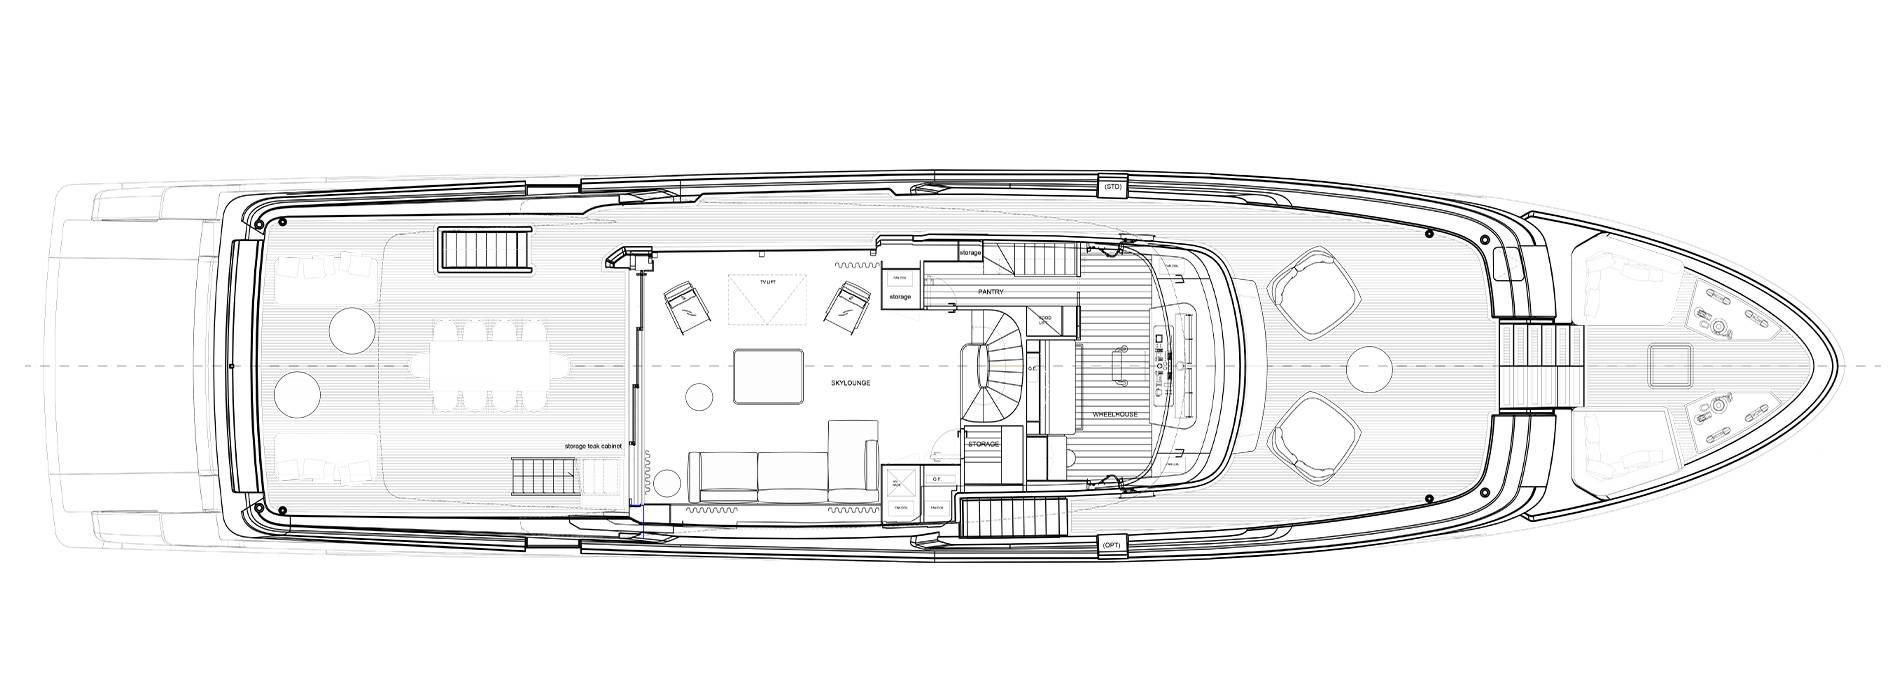 Sanlorenzo Yachts SD118 верхний палуба